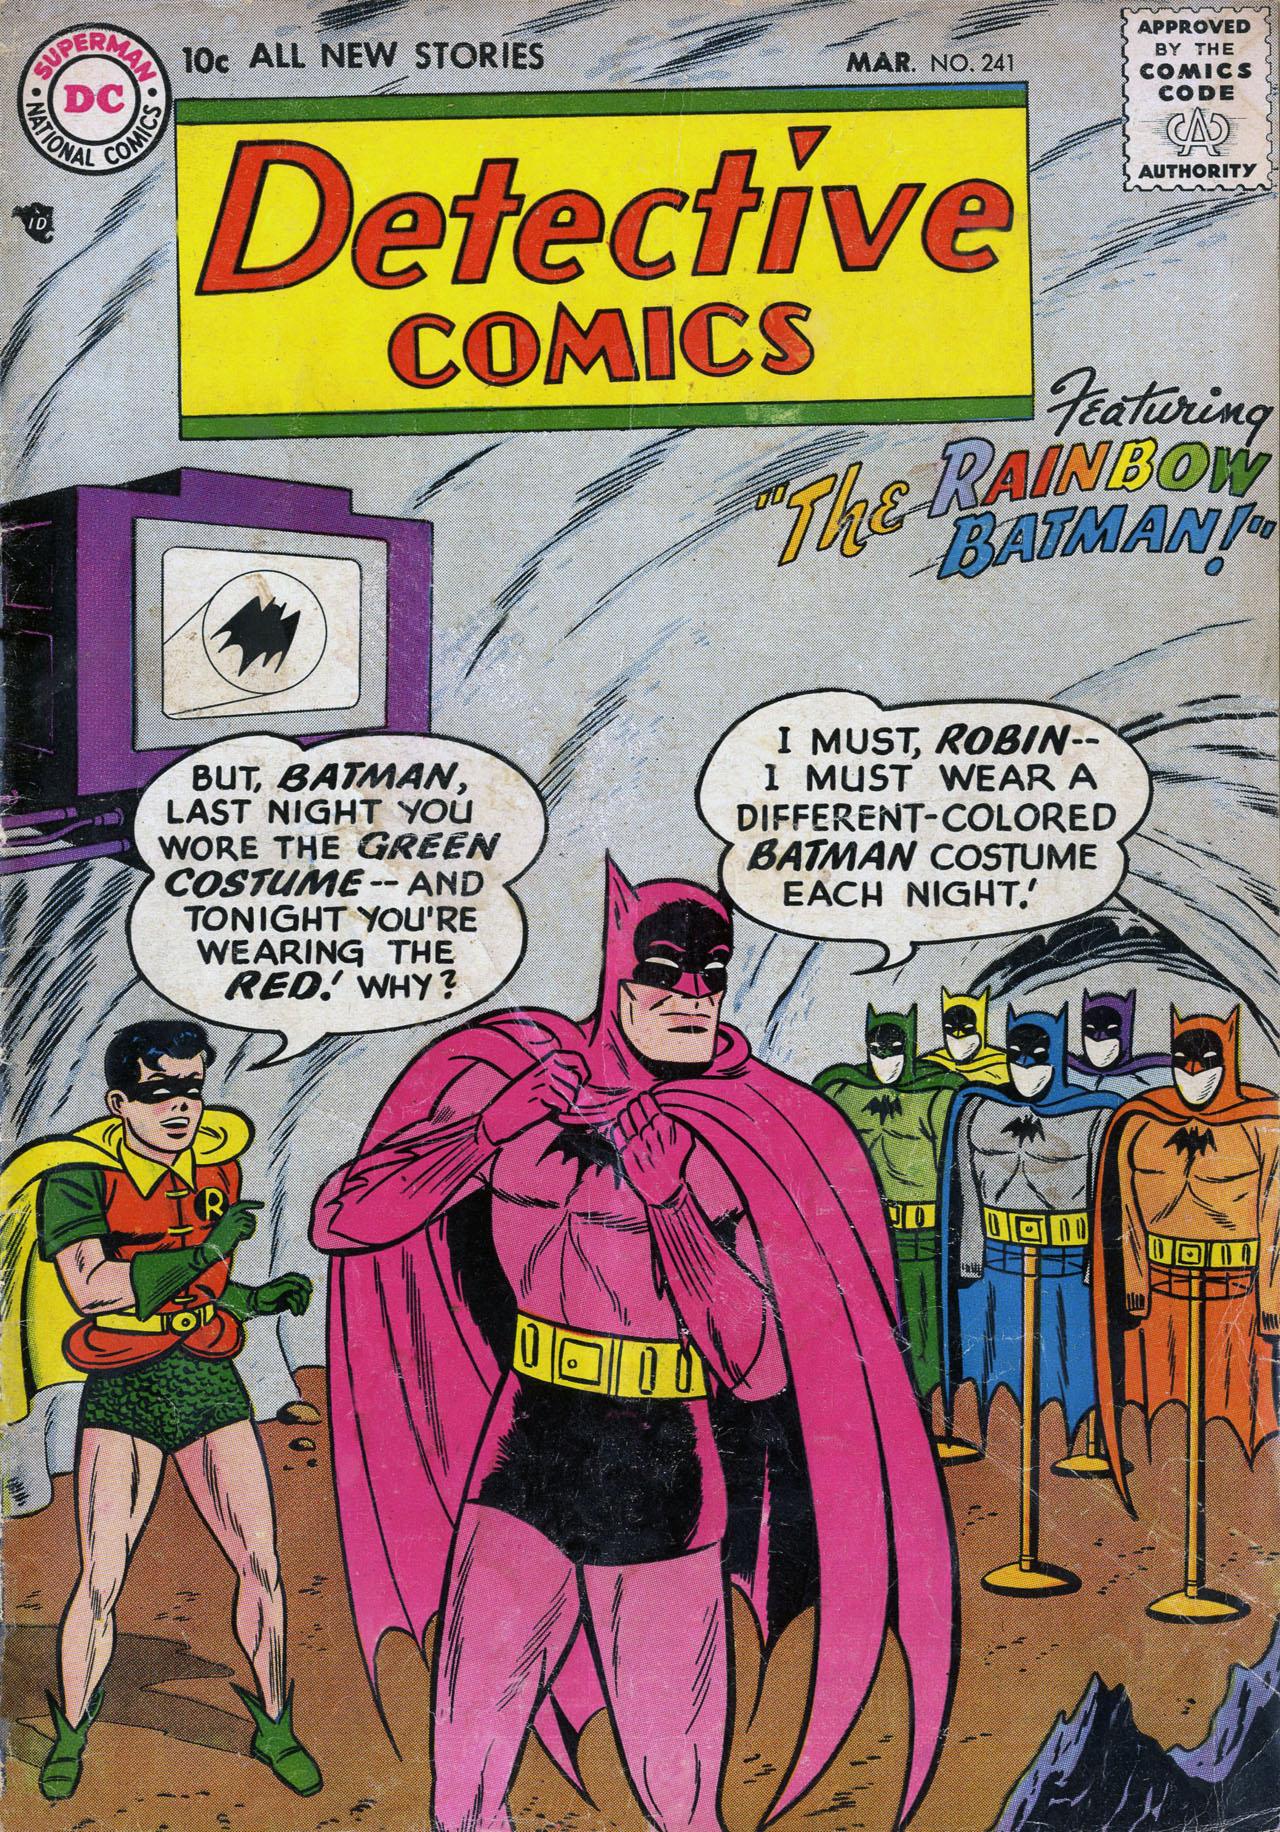 Read online Detective Comics (1937) comic -  Issue #241 - 1